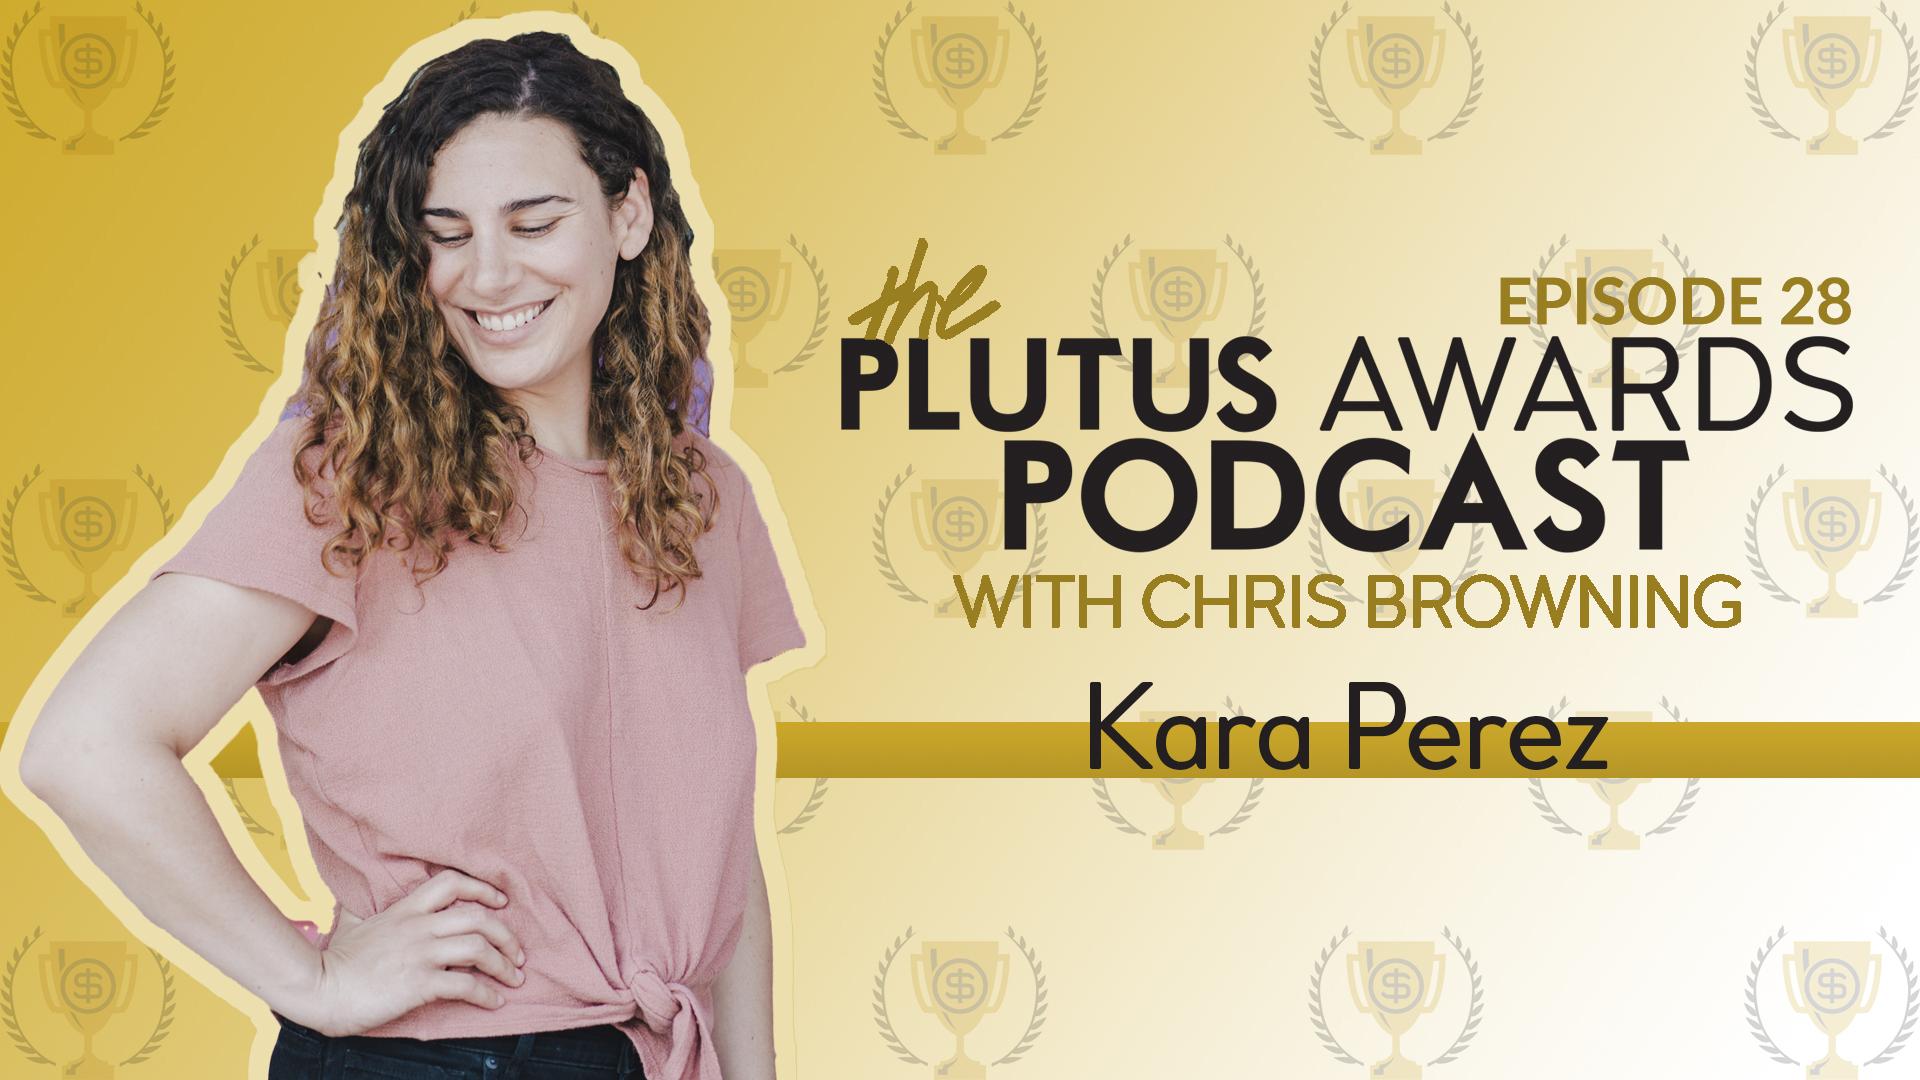 Kara Perez Plutus Awards Podcast Featured Image